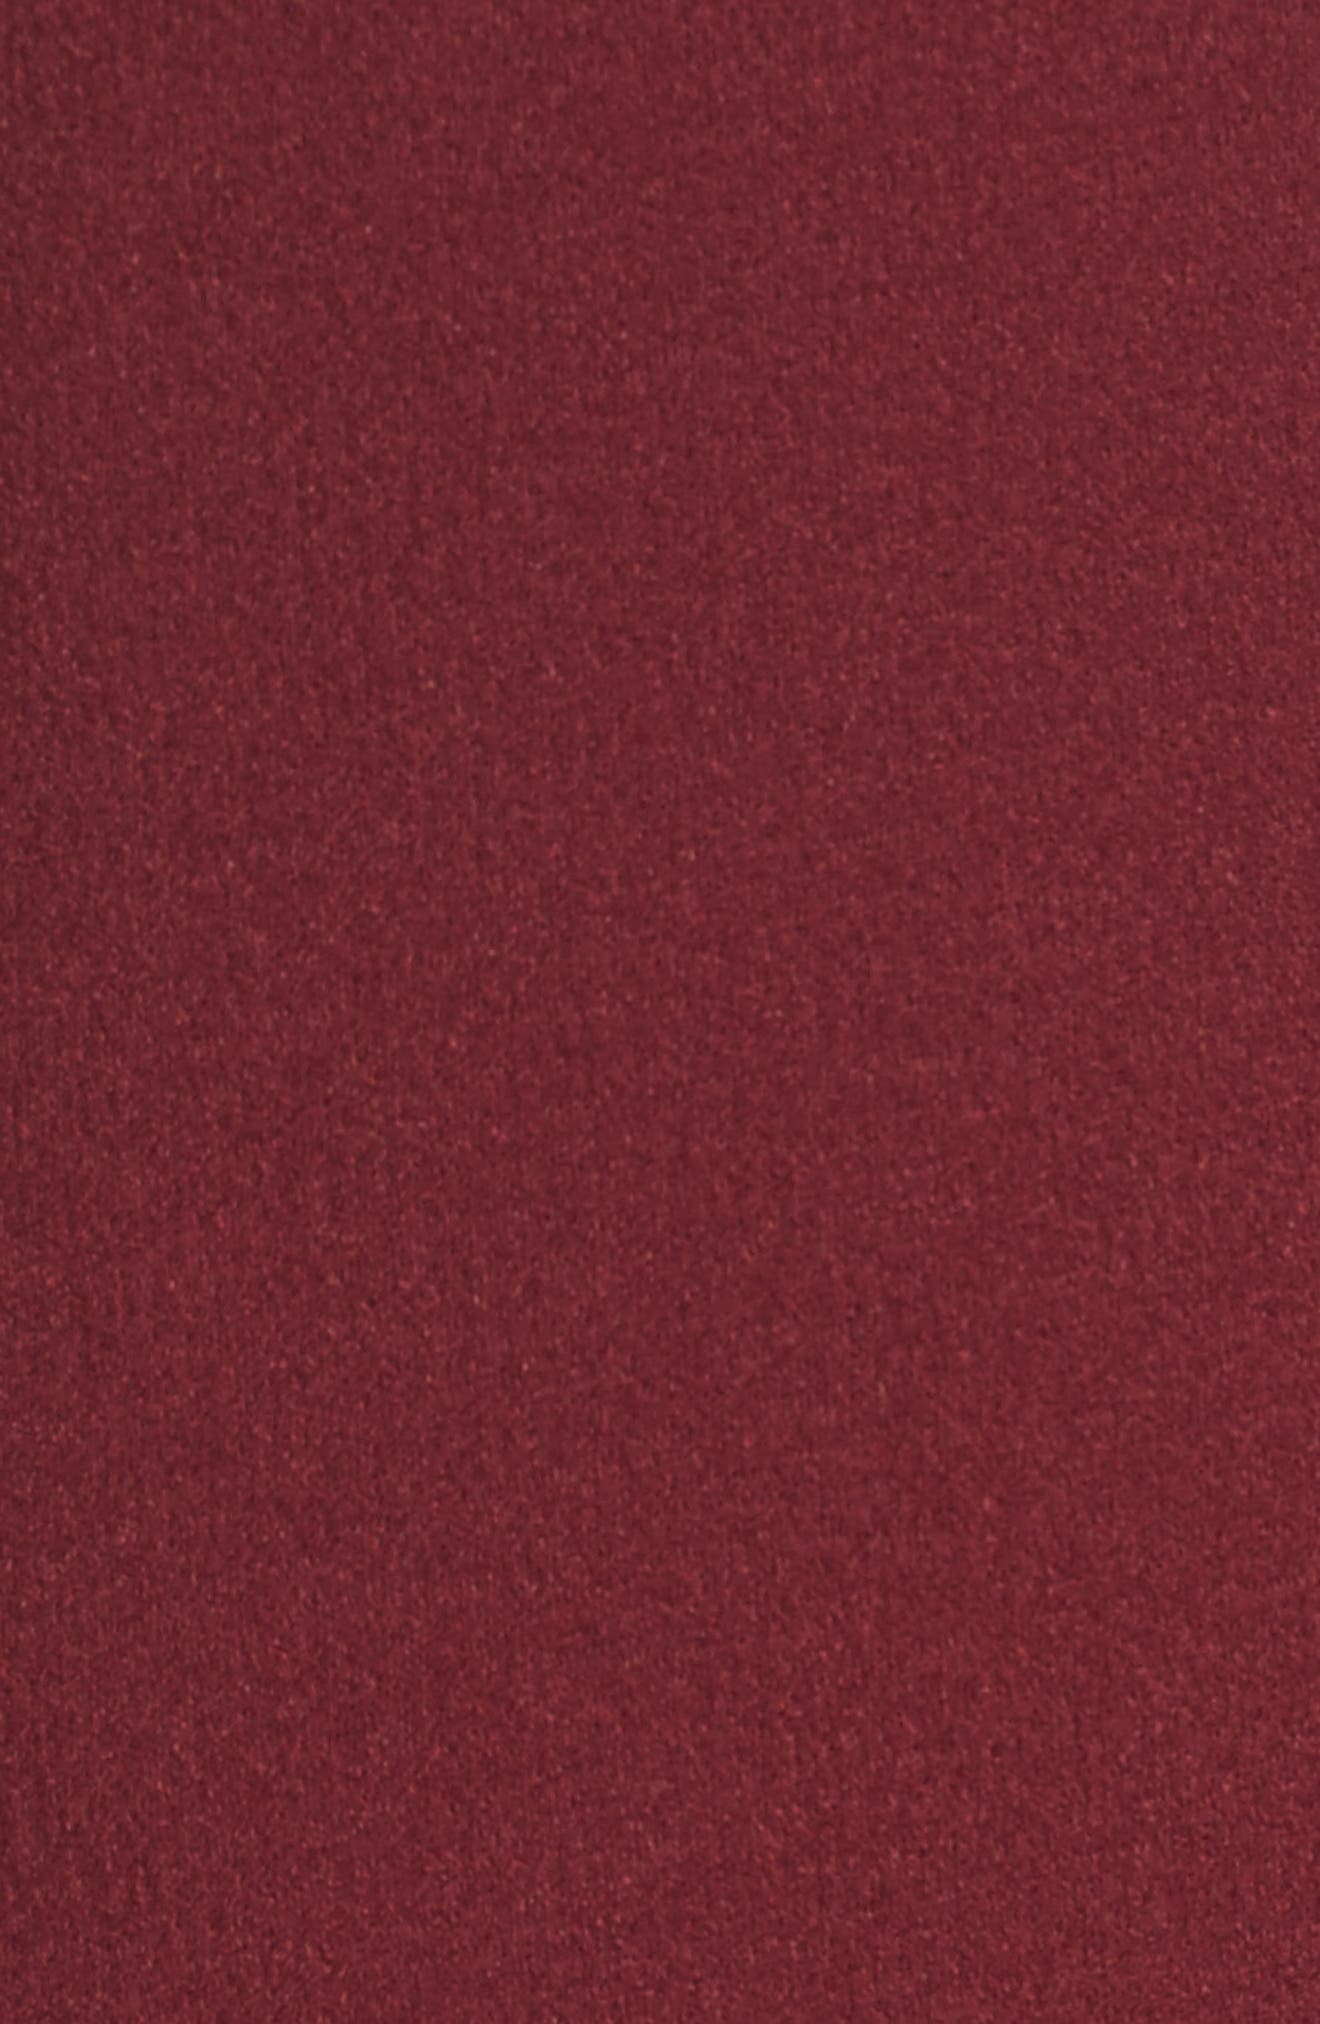 Hailey Crepe Dress,                             Alternate thumbnail 134, color,